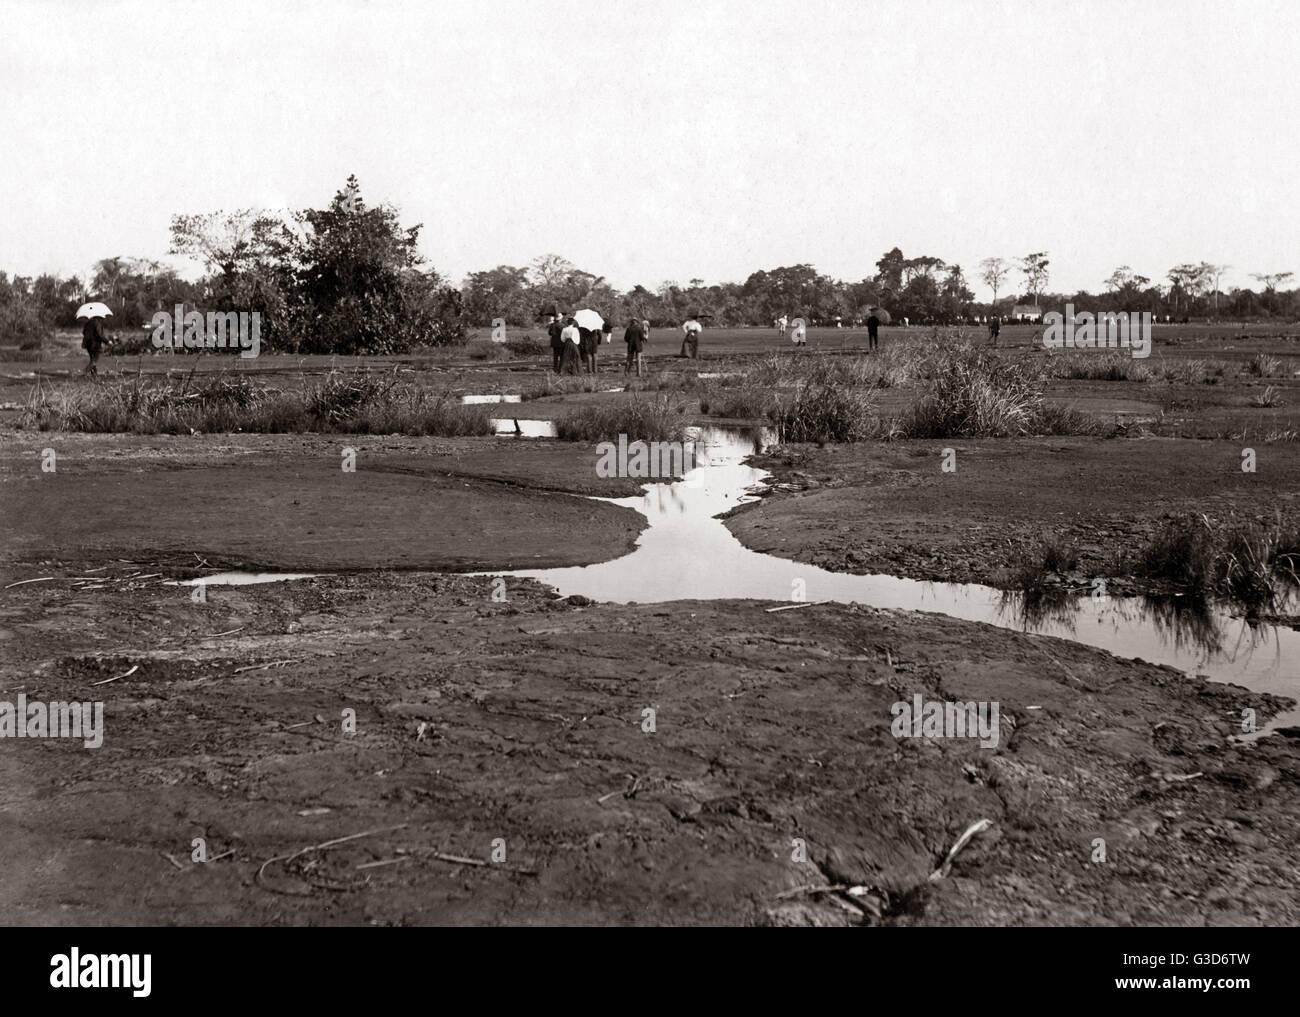 The pitch lake, Trinidad, West Indies, circa 1900.     Date: circa 1900 - Stock Image